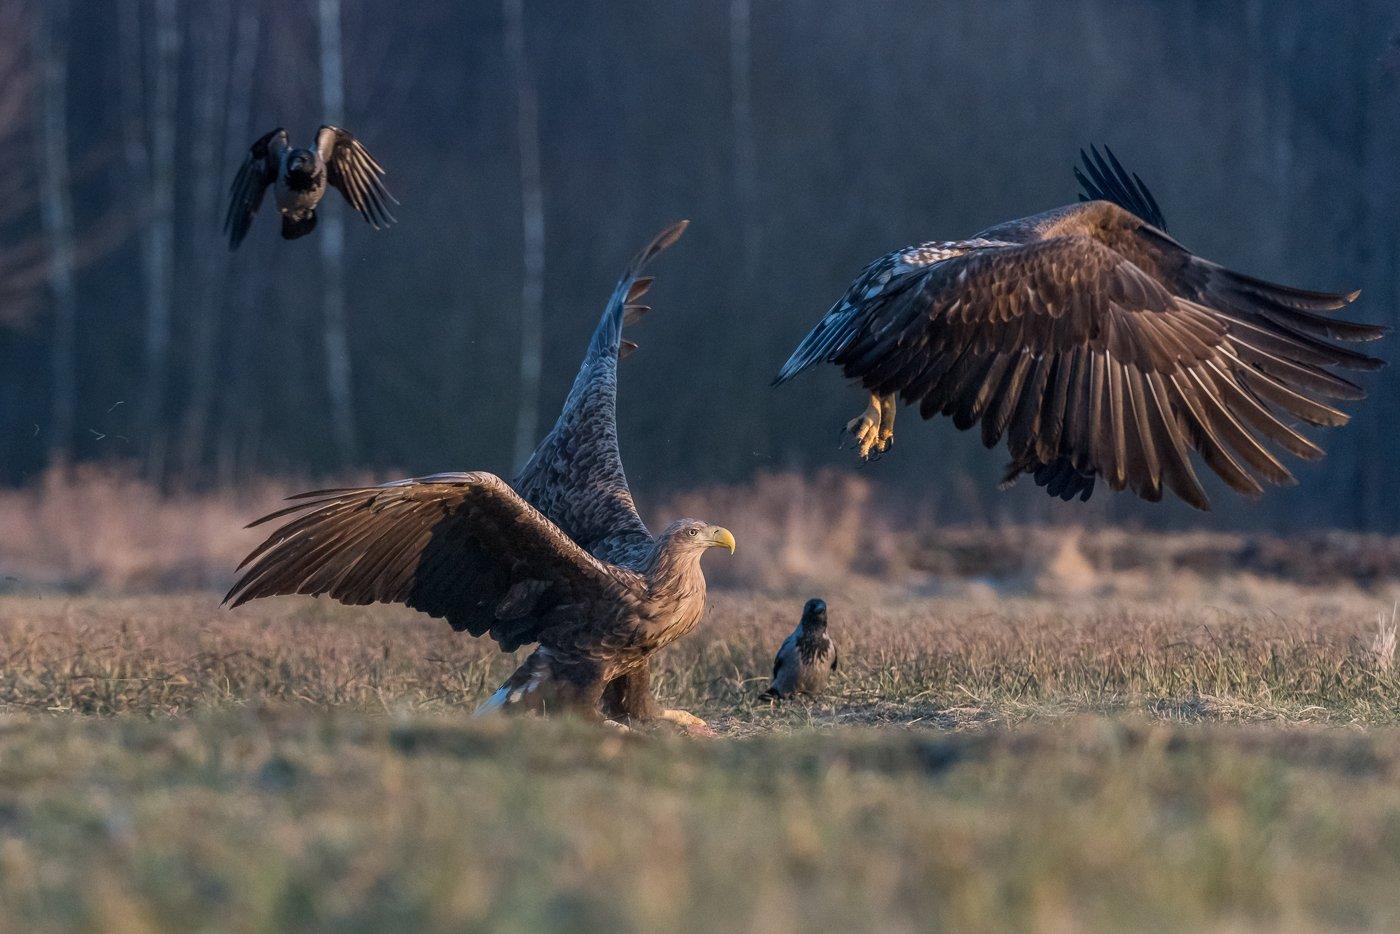 Orzeł bielik, Haliaeetus albicilla, bielik zwyczajny, White-tailed Sea Eagle, Sea Eagle, Dominik Chrzanowski